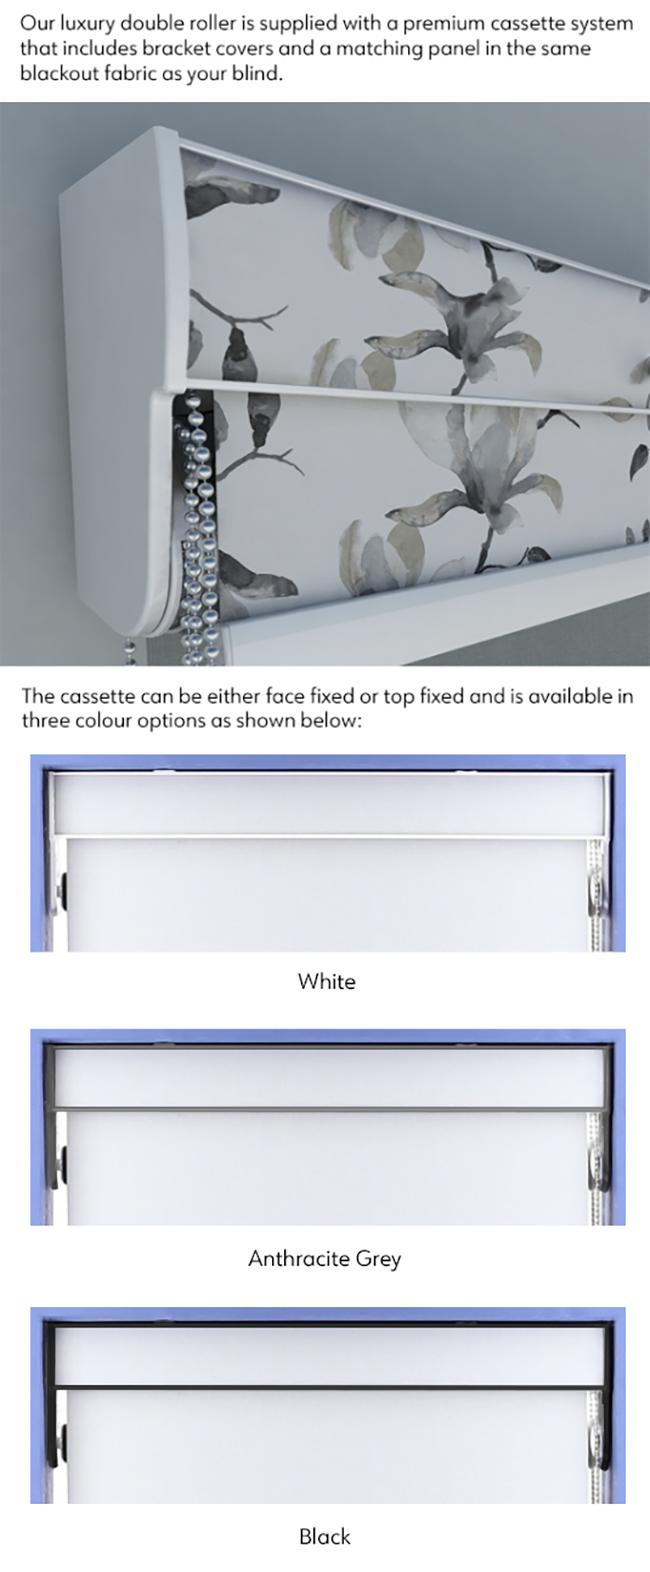 Double Bracket Luxury Roller System